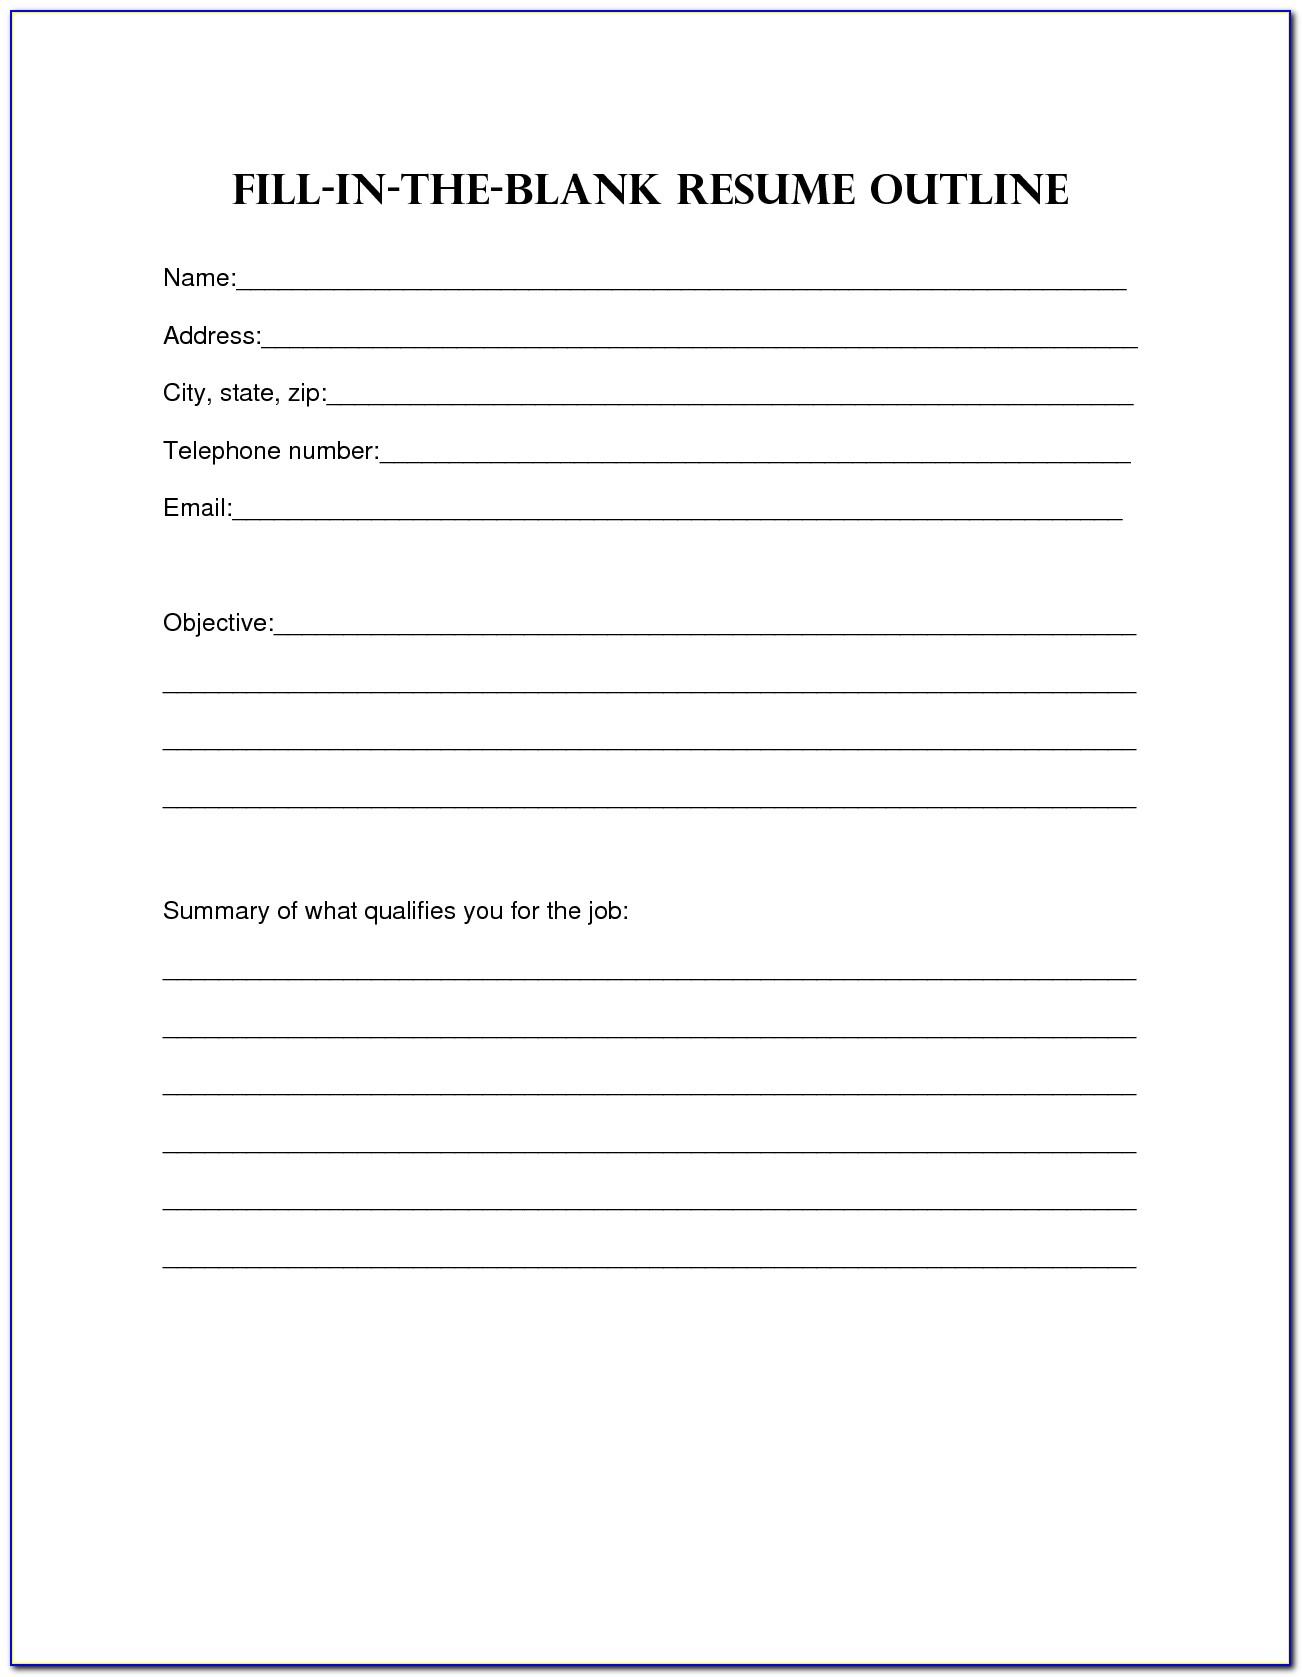 Resume Cover Letter Fill In The Blanks